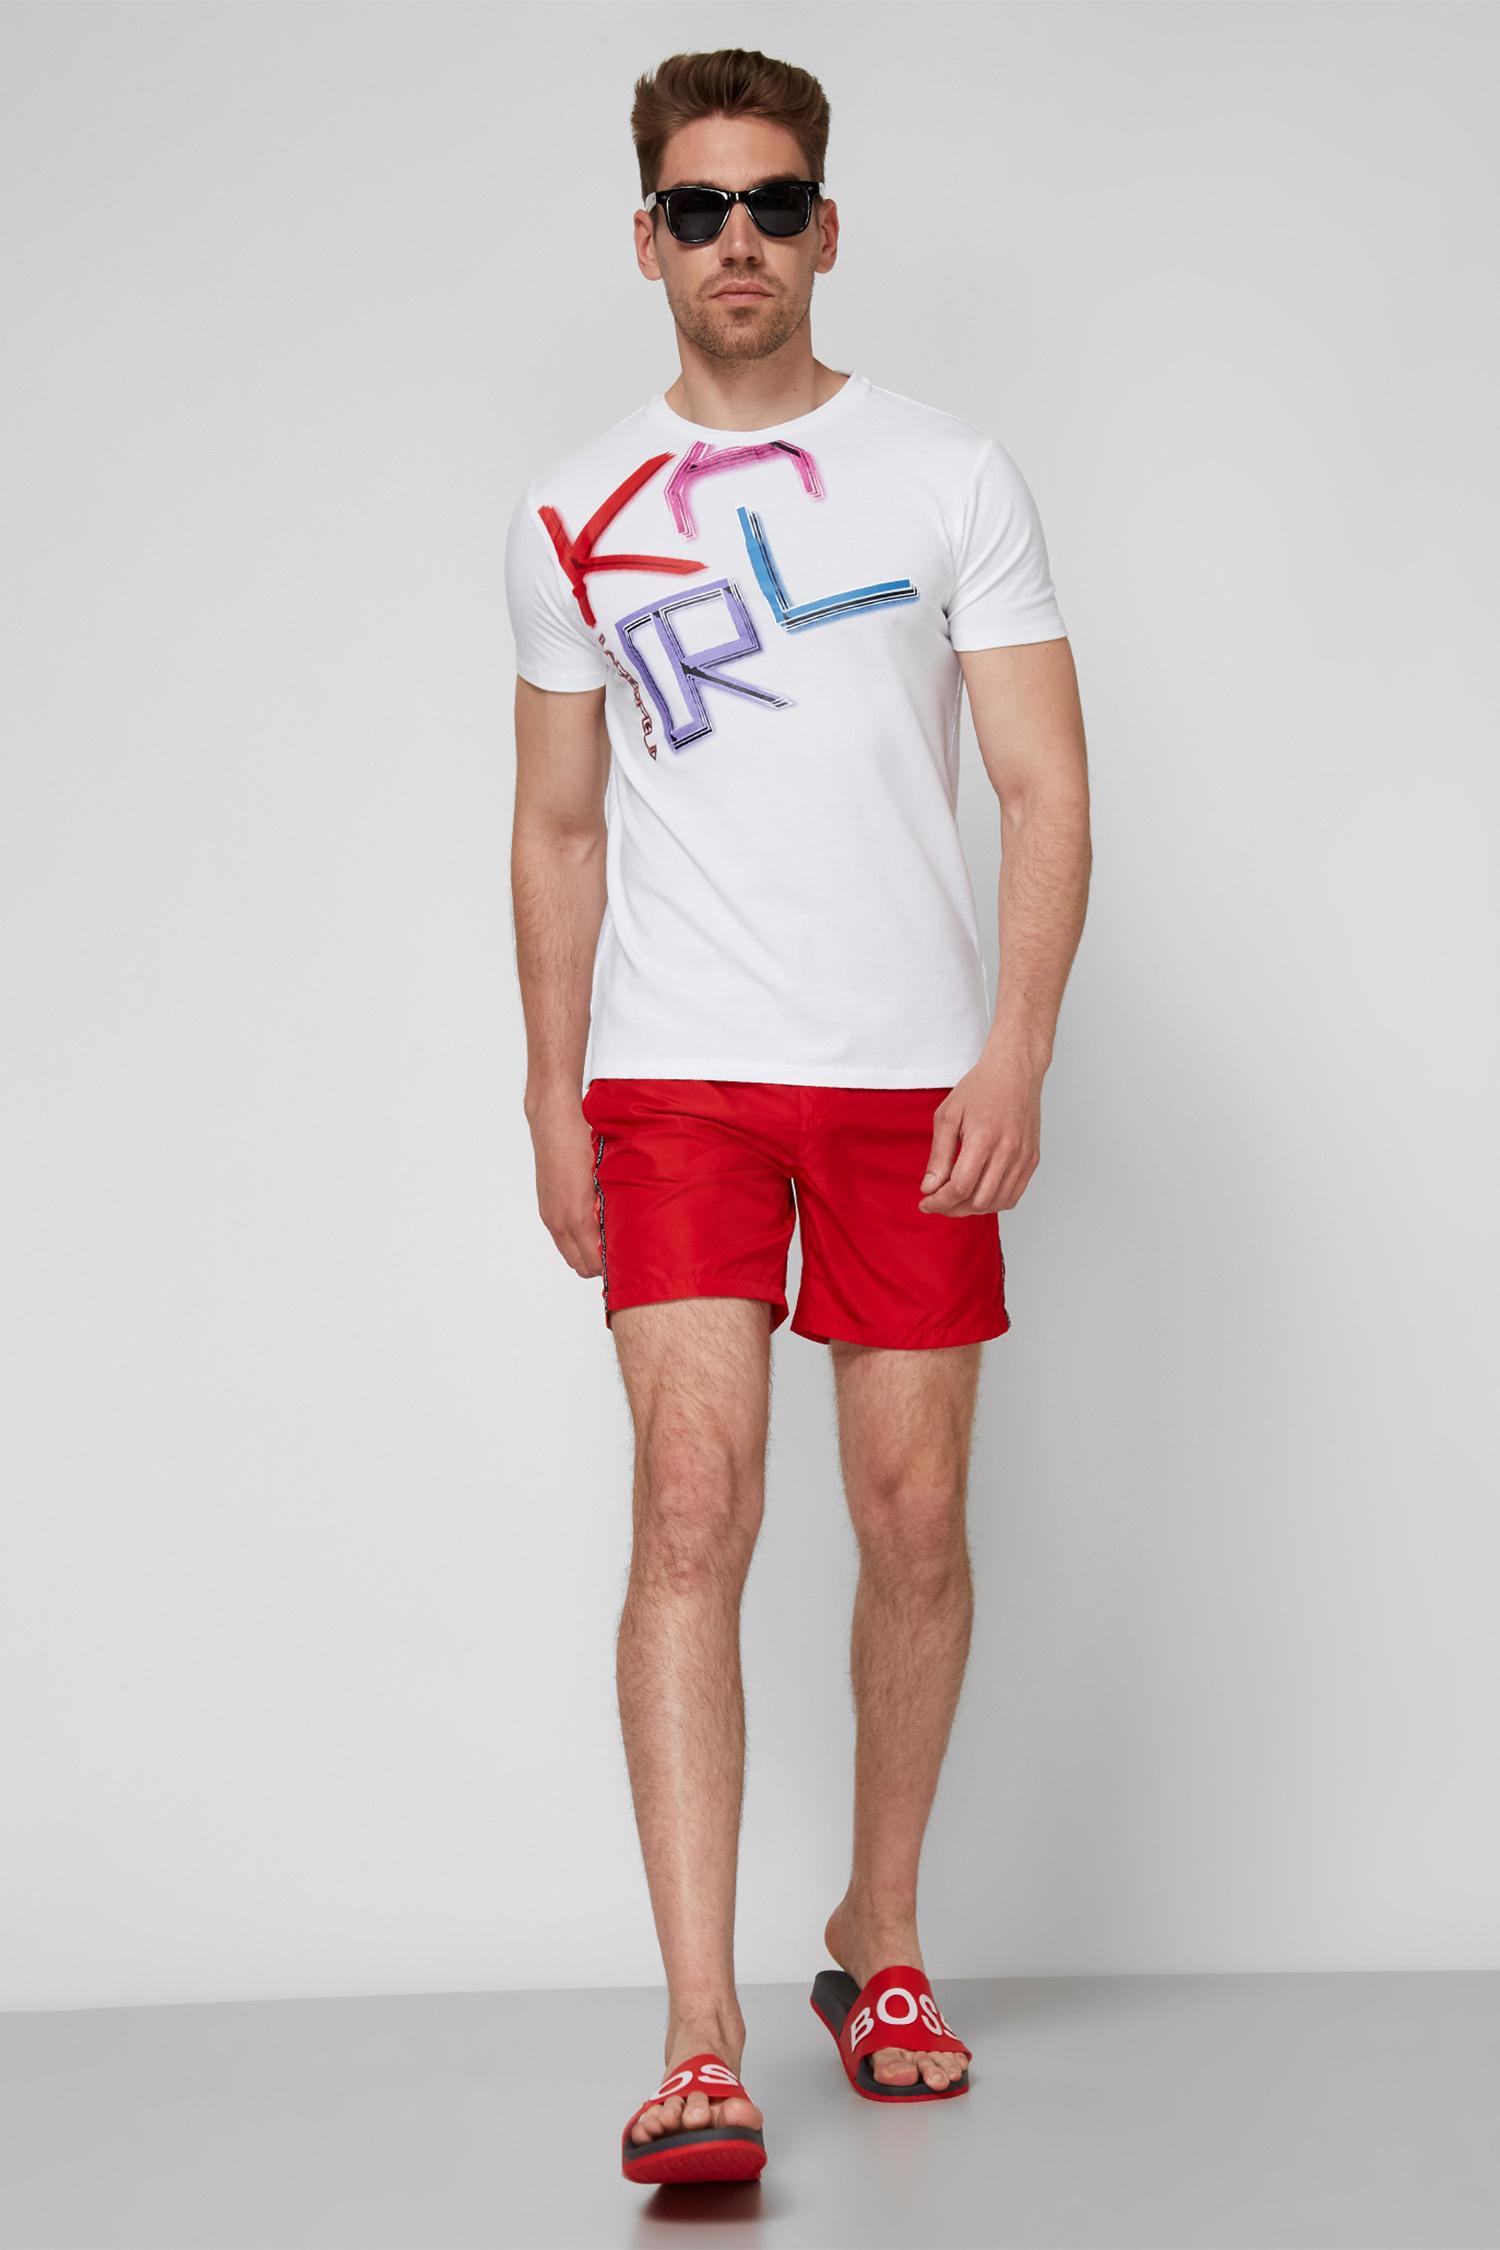 Мужские красные плавательные шорты Karl Lagerfeld KL21MBM03;RED